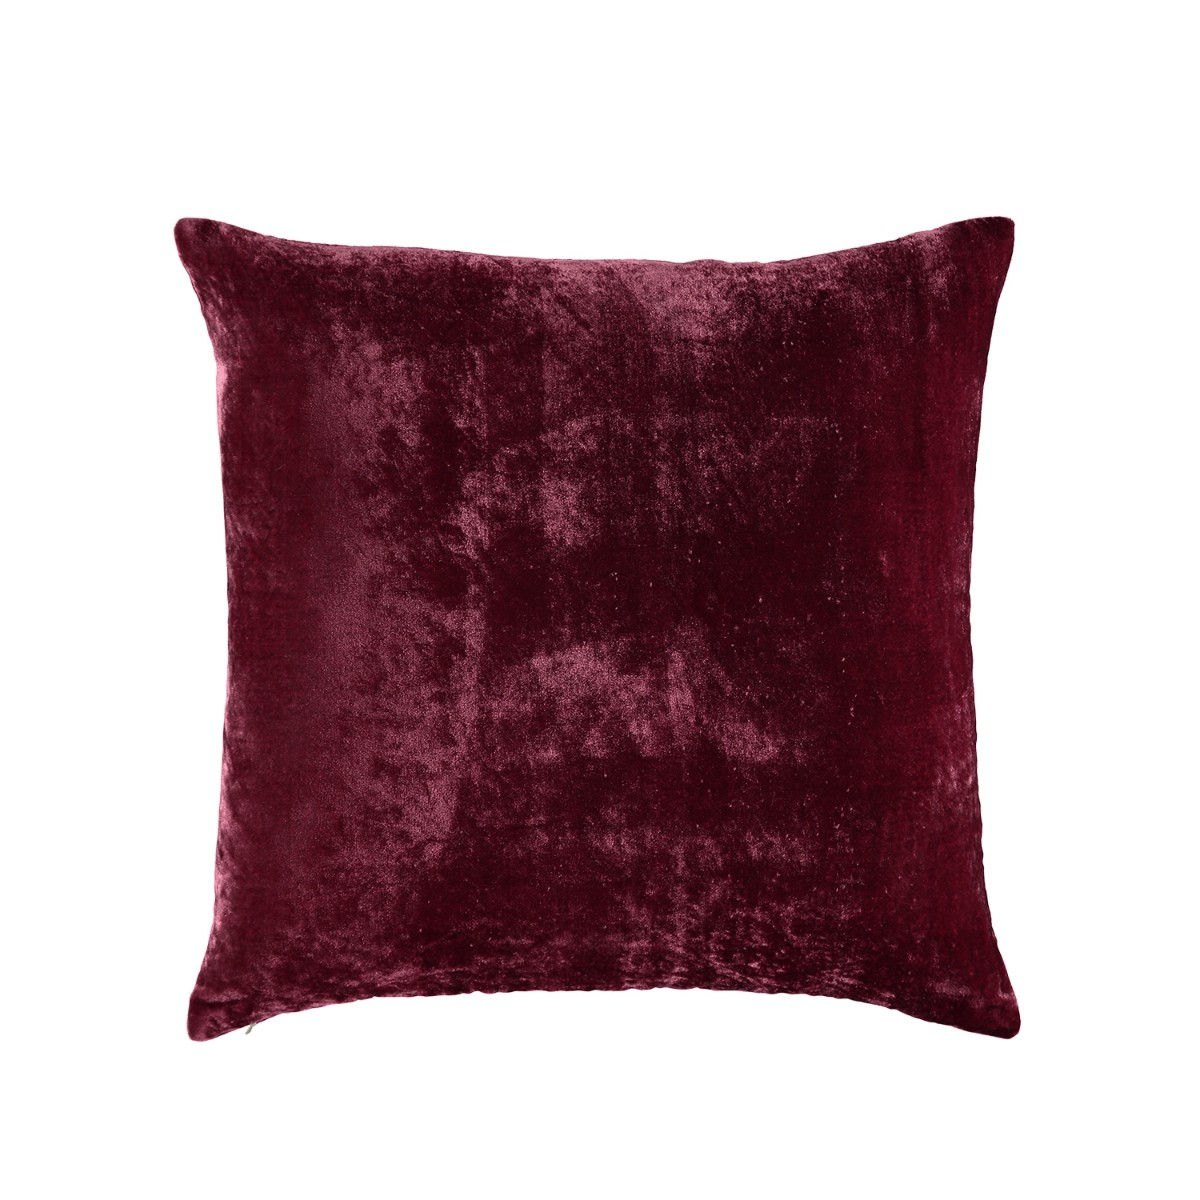 William Yeoward |Paddy Velvet Cushion Plum